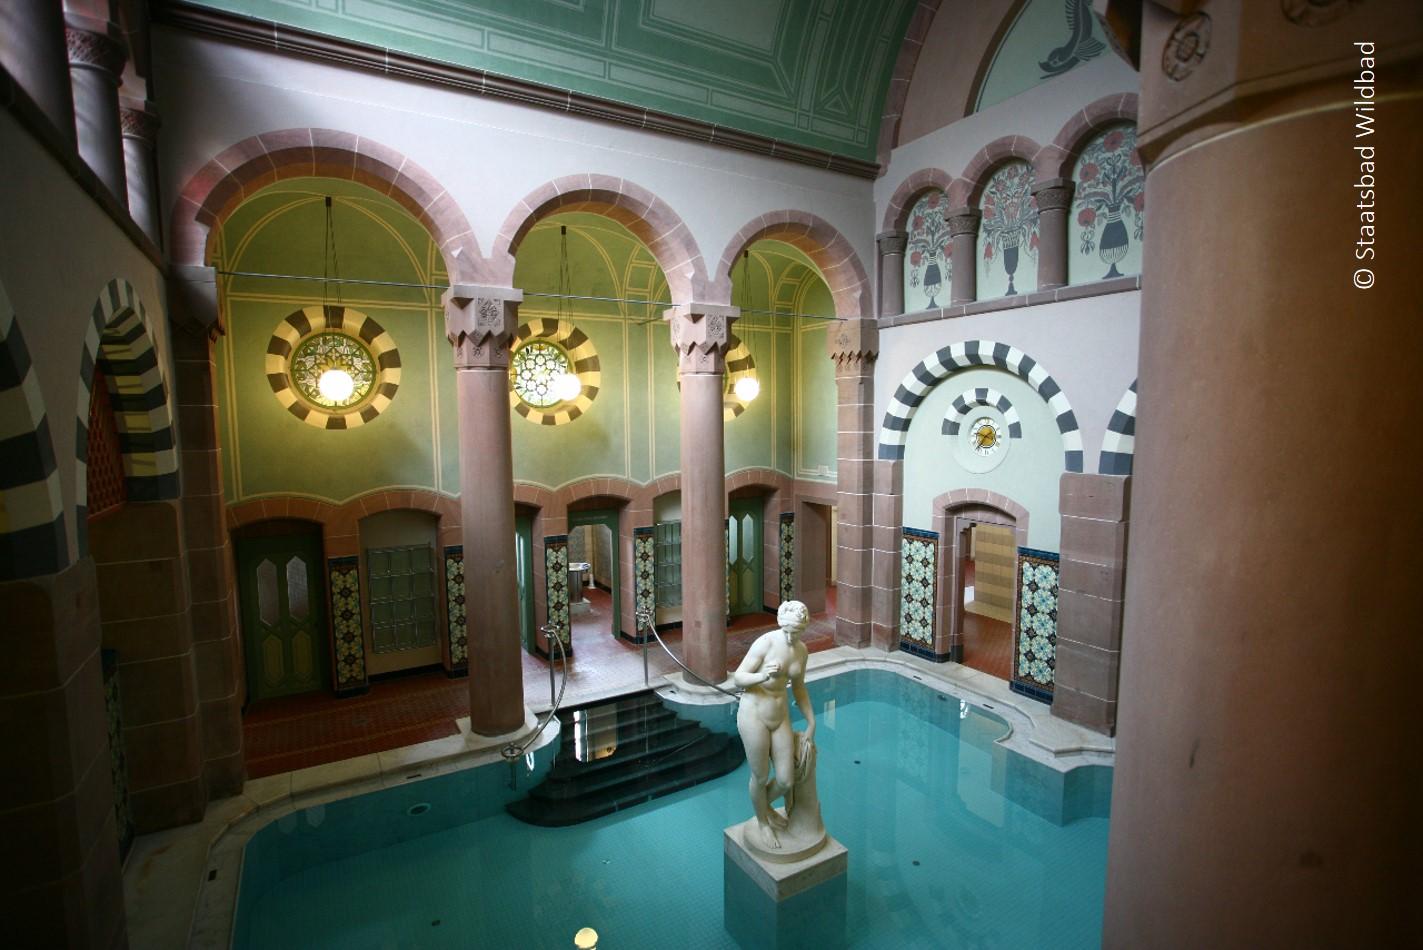 Das Palais Thermal in Bad Wildbad ...